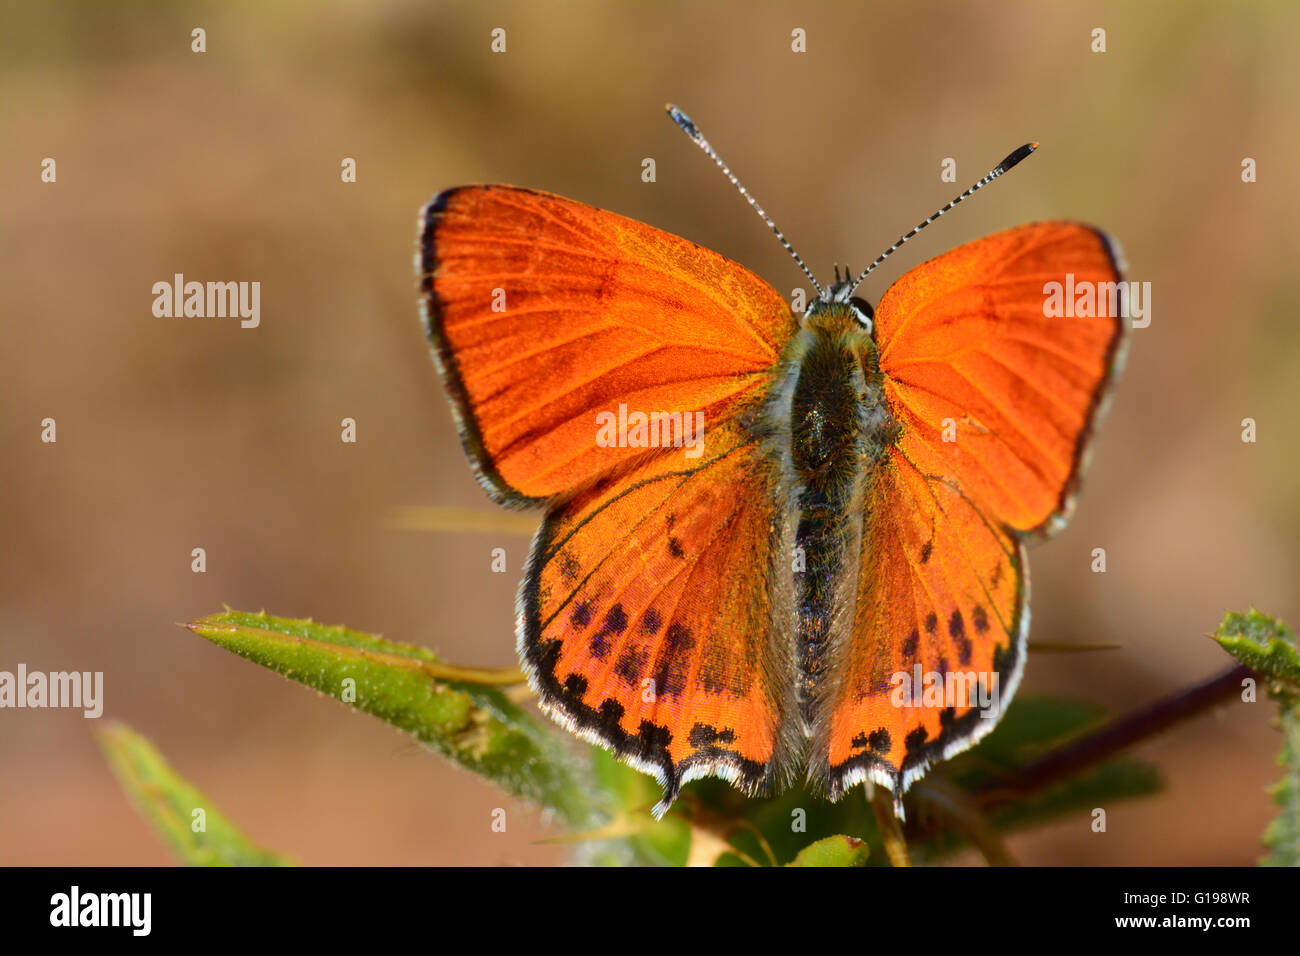 Fiery moindre papillon cuivre Photo Stock